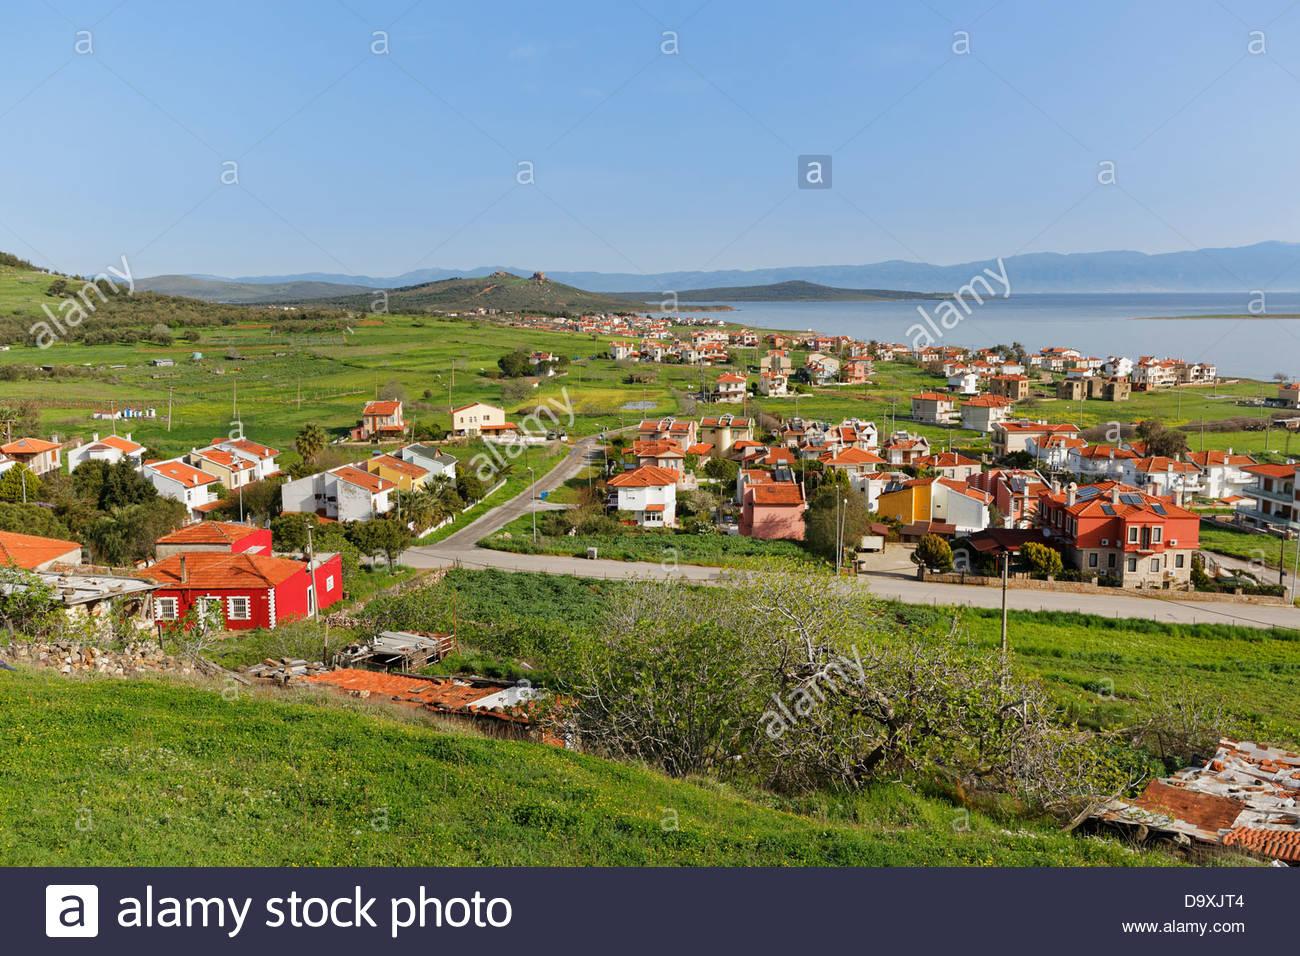 Turkey, View of Cunda island near Ayvalik - Stock Image